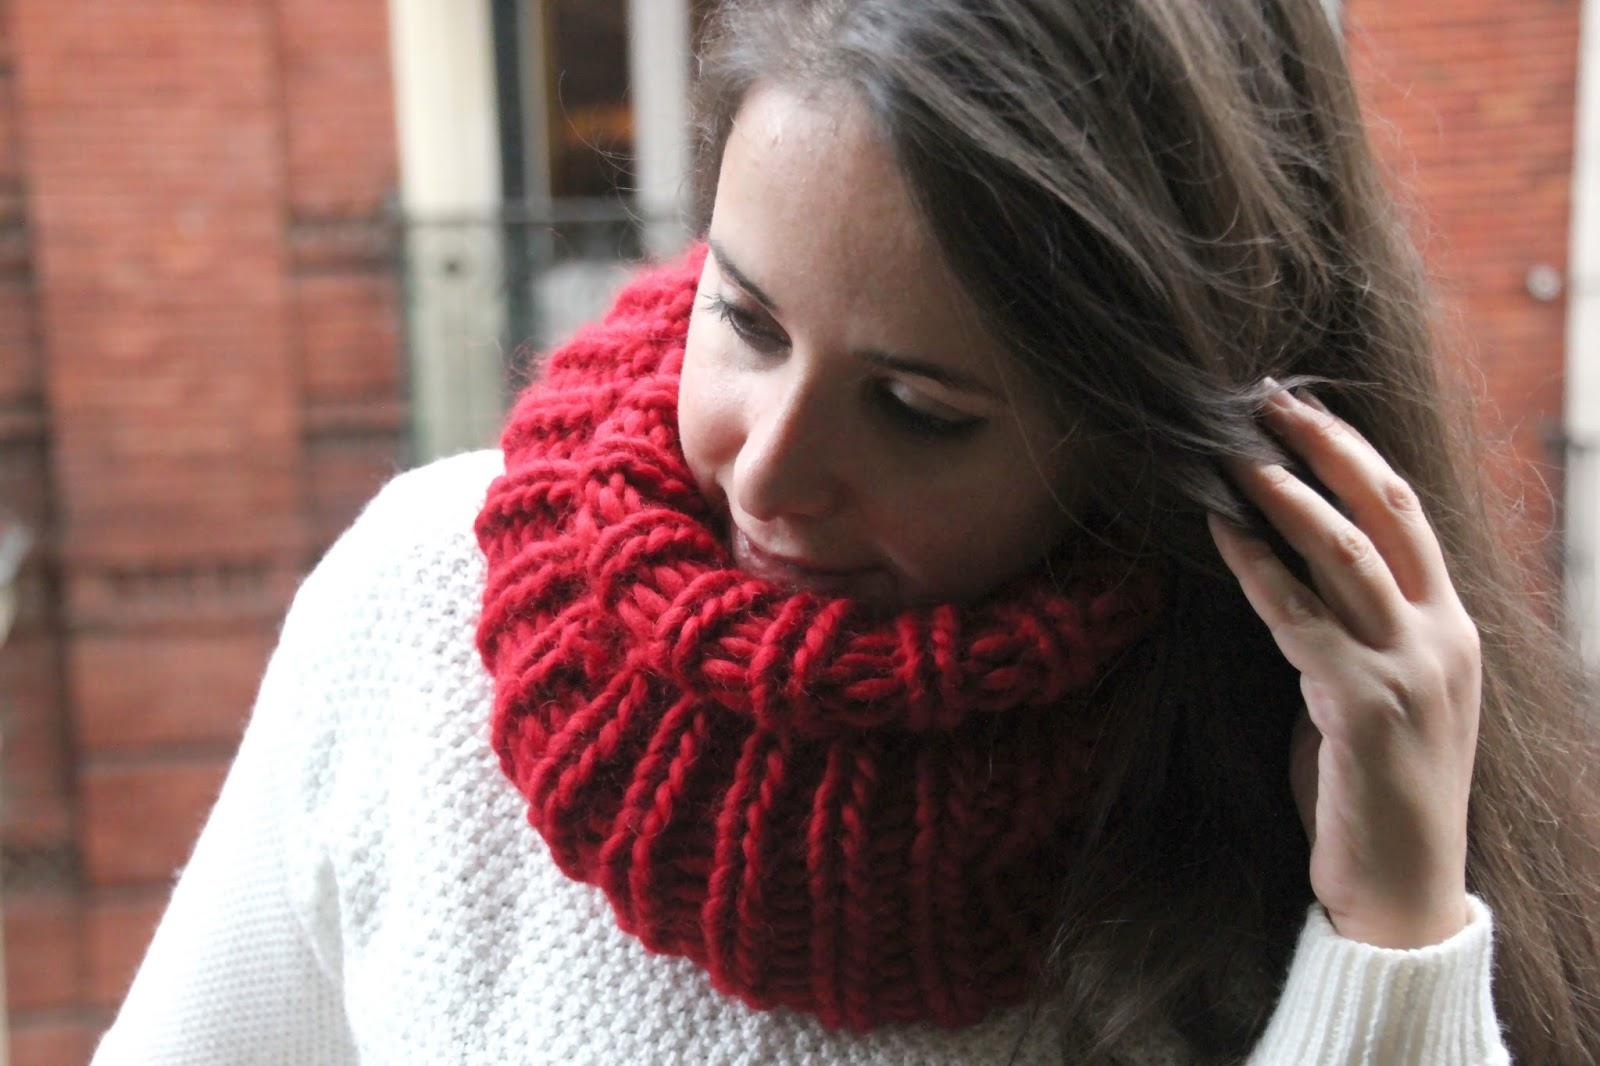 Como hacer bufandas de lana con dos agujas en forma de cuello - Puntos de agujas de lana ...